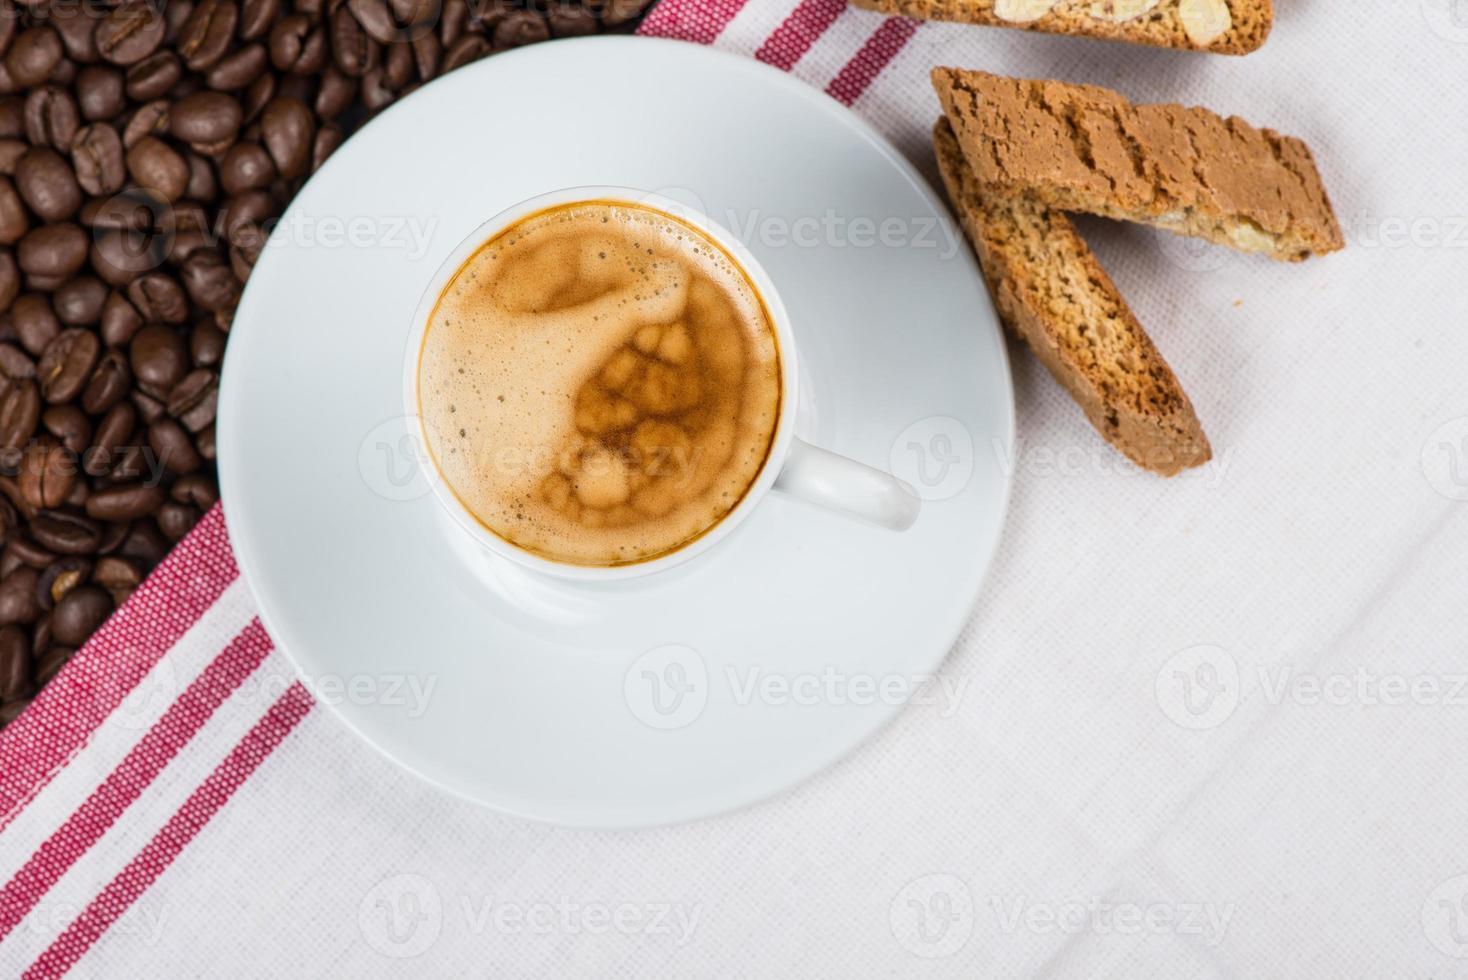 tazza di caffè espresso cremoso su chicchi di caffè tostati foto